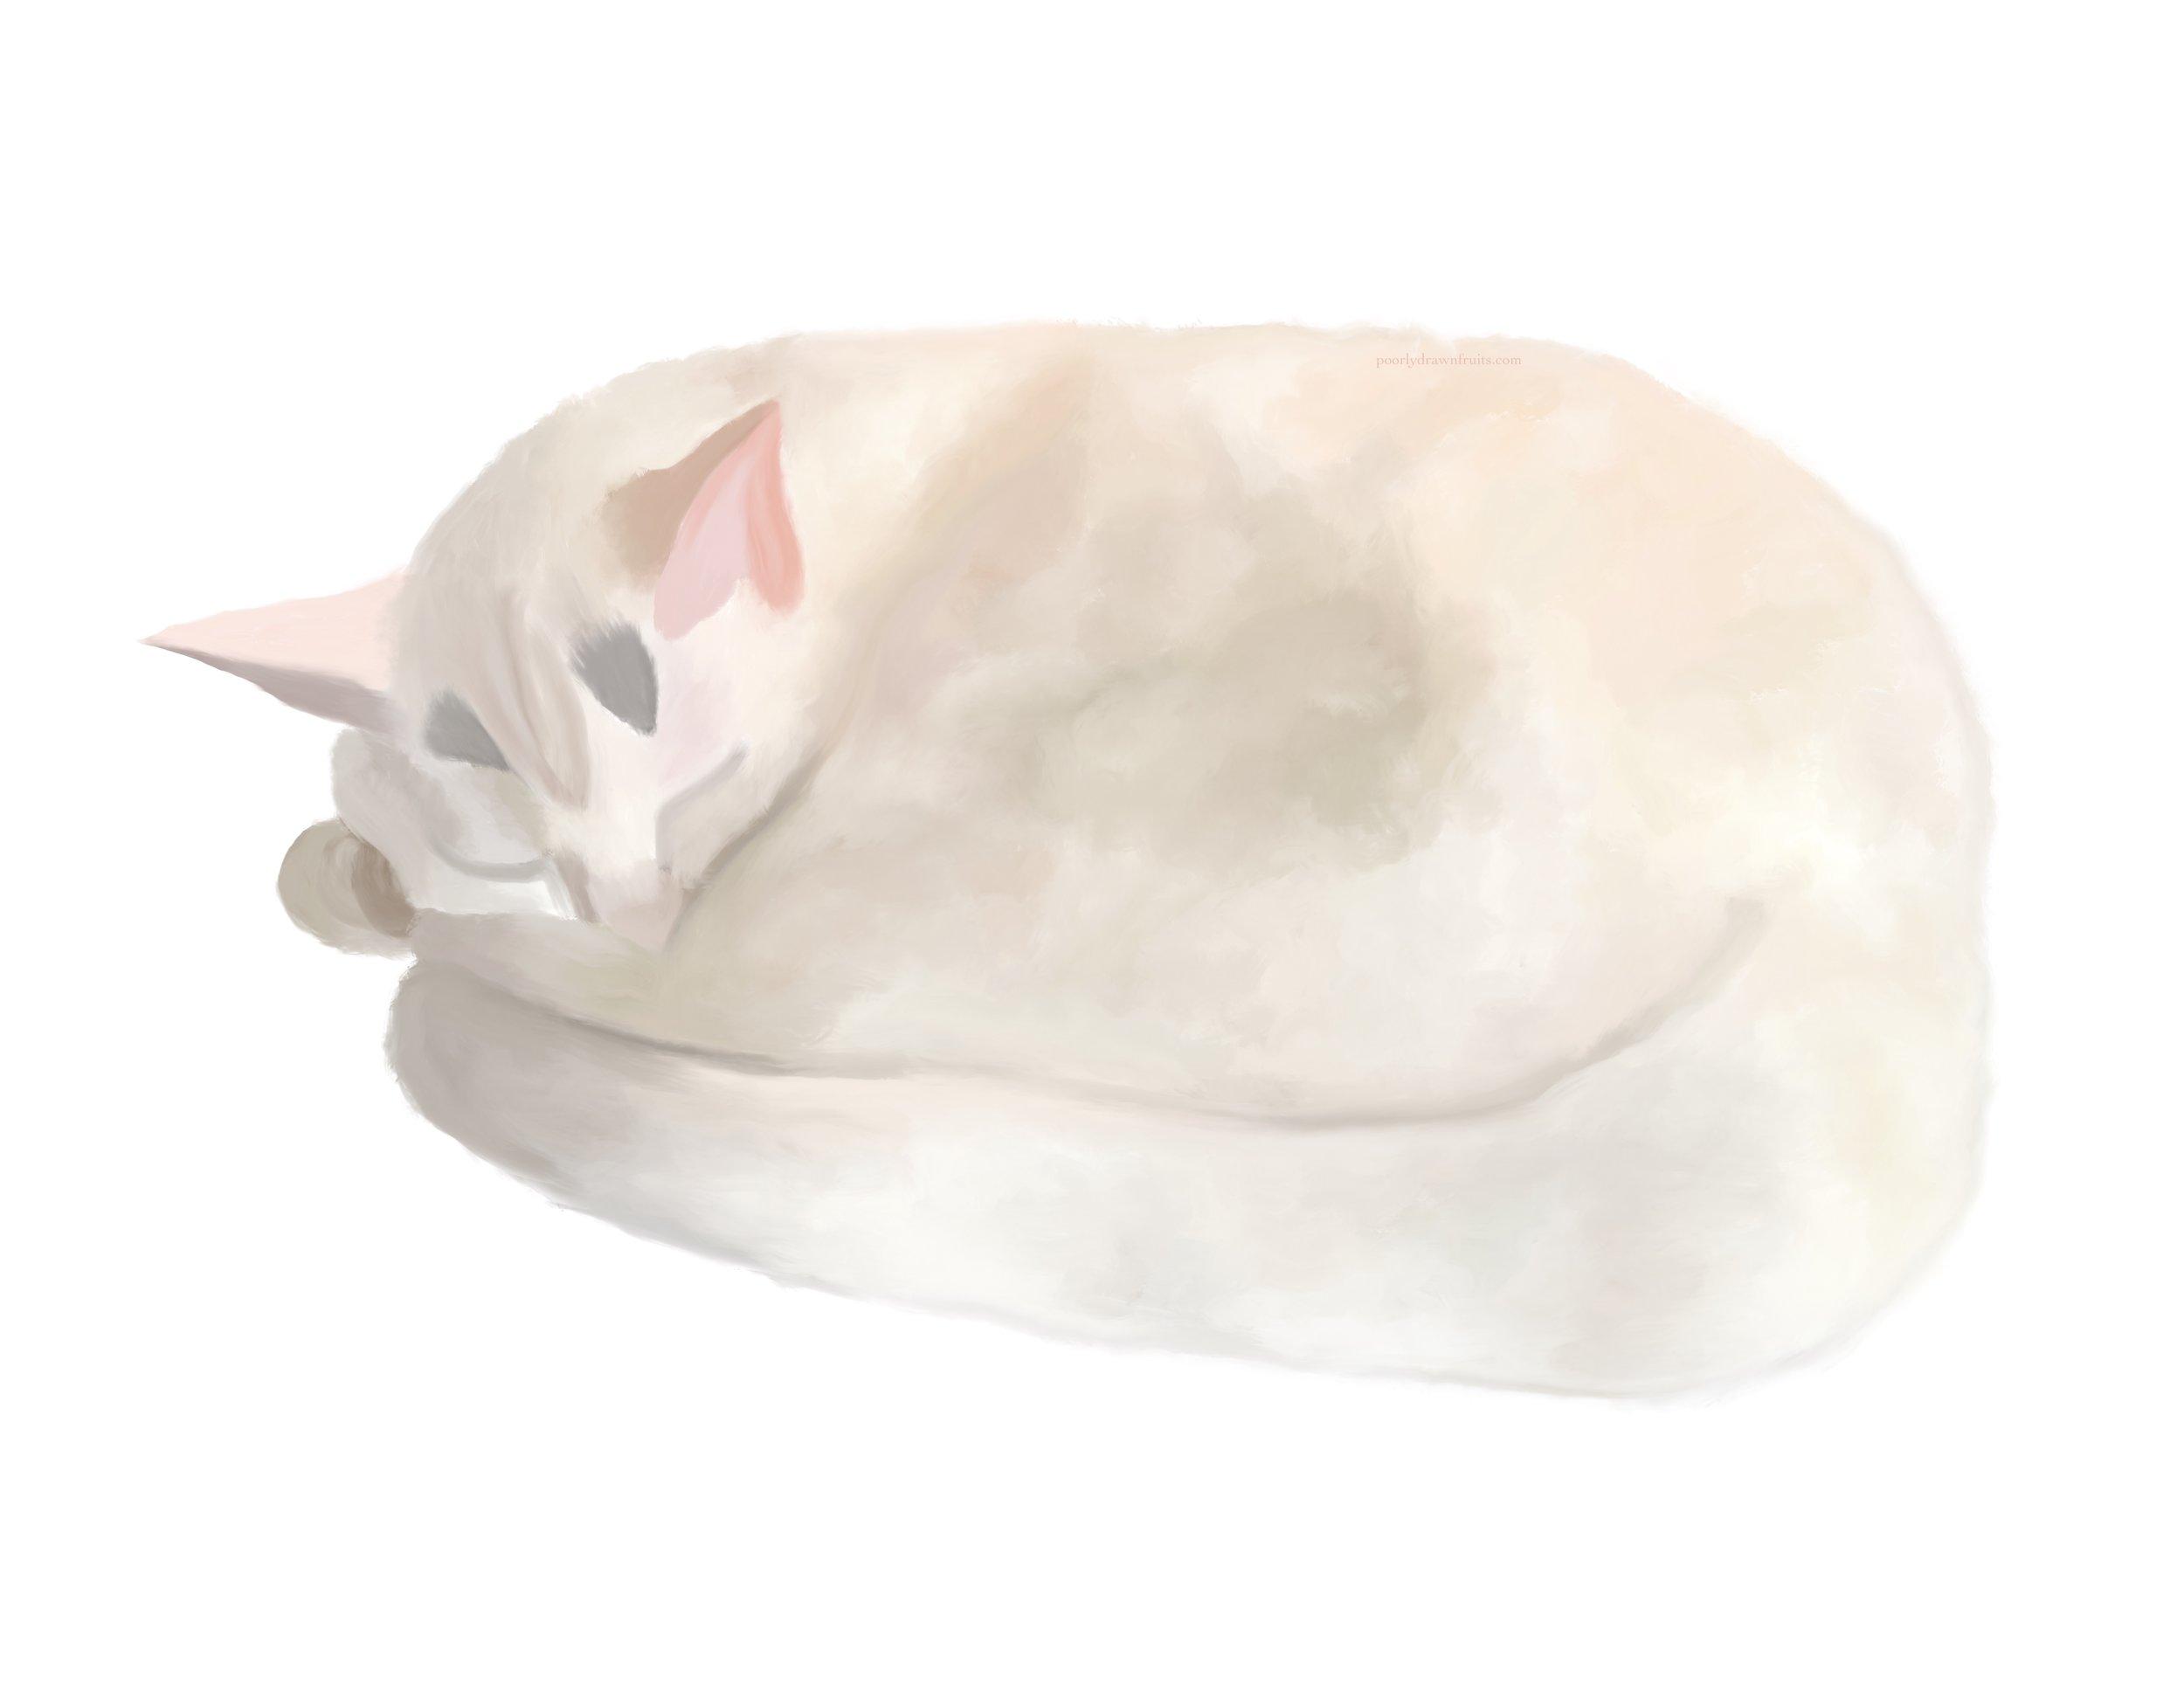 cat, cats, sleeping cat, painting, digital painting, ipad, procreate, kitten, white cat